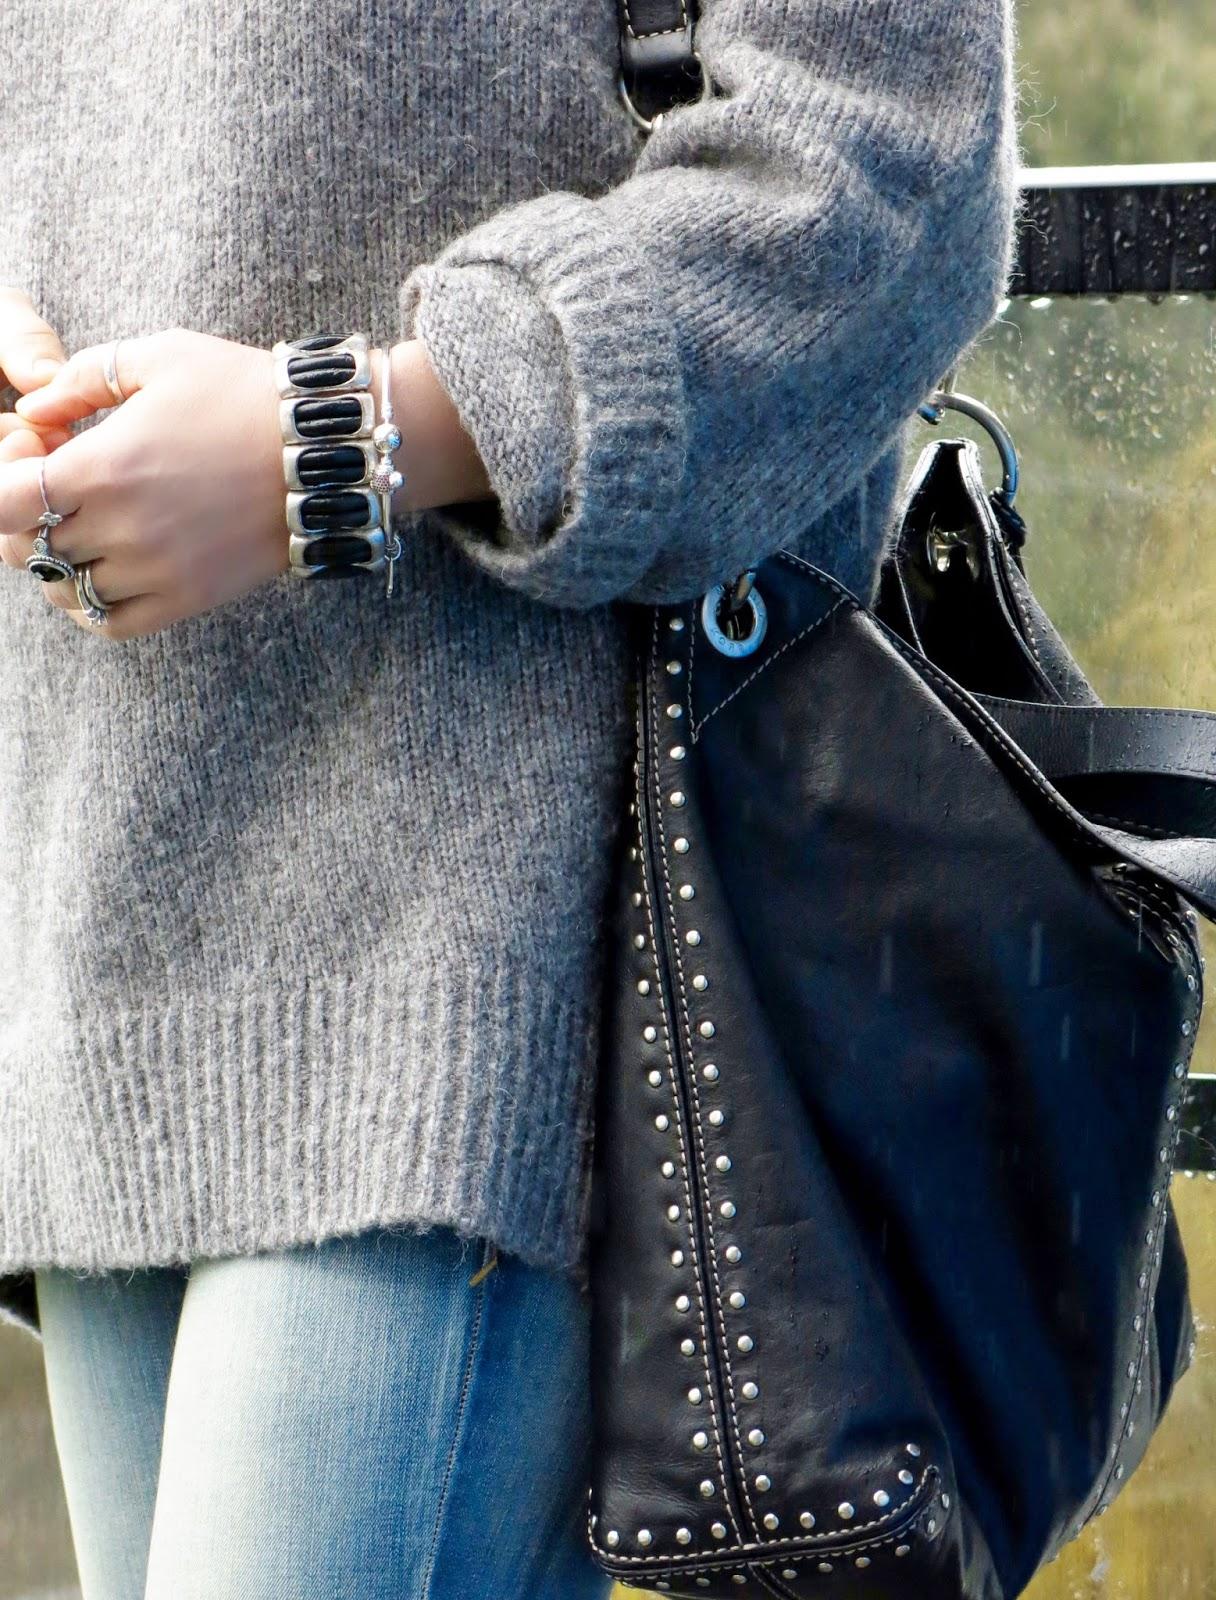 oversized woolly sweater, Michael Kors bag